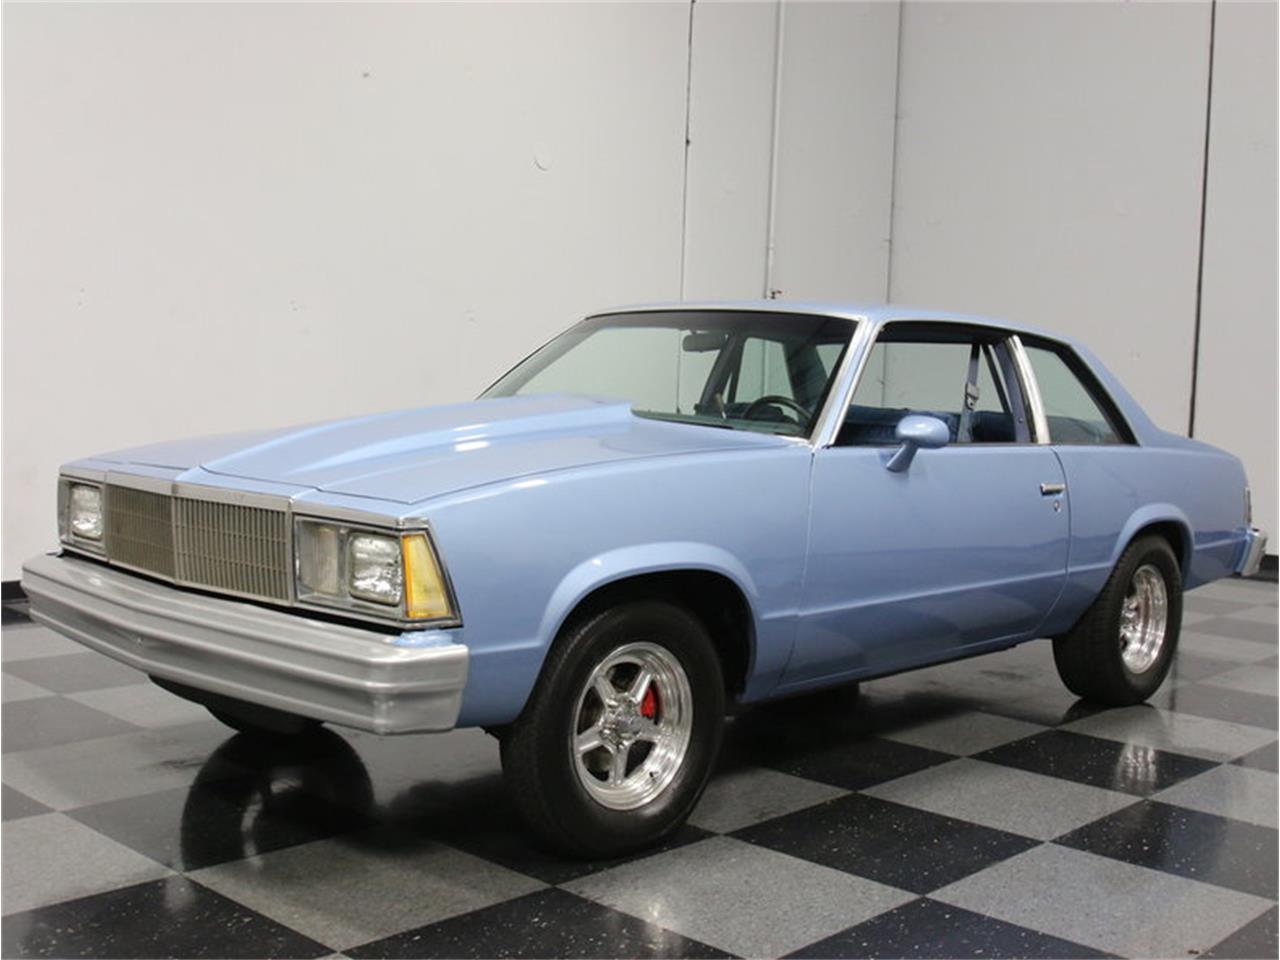 Malibu 1980 chevrolet malibu listings : cheapest RWD cars?